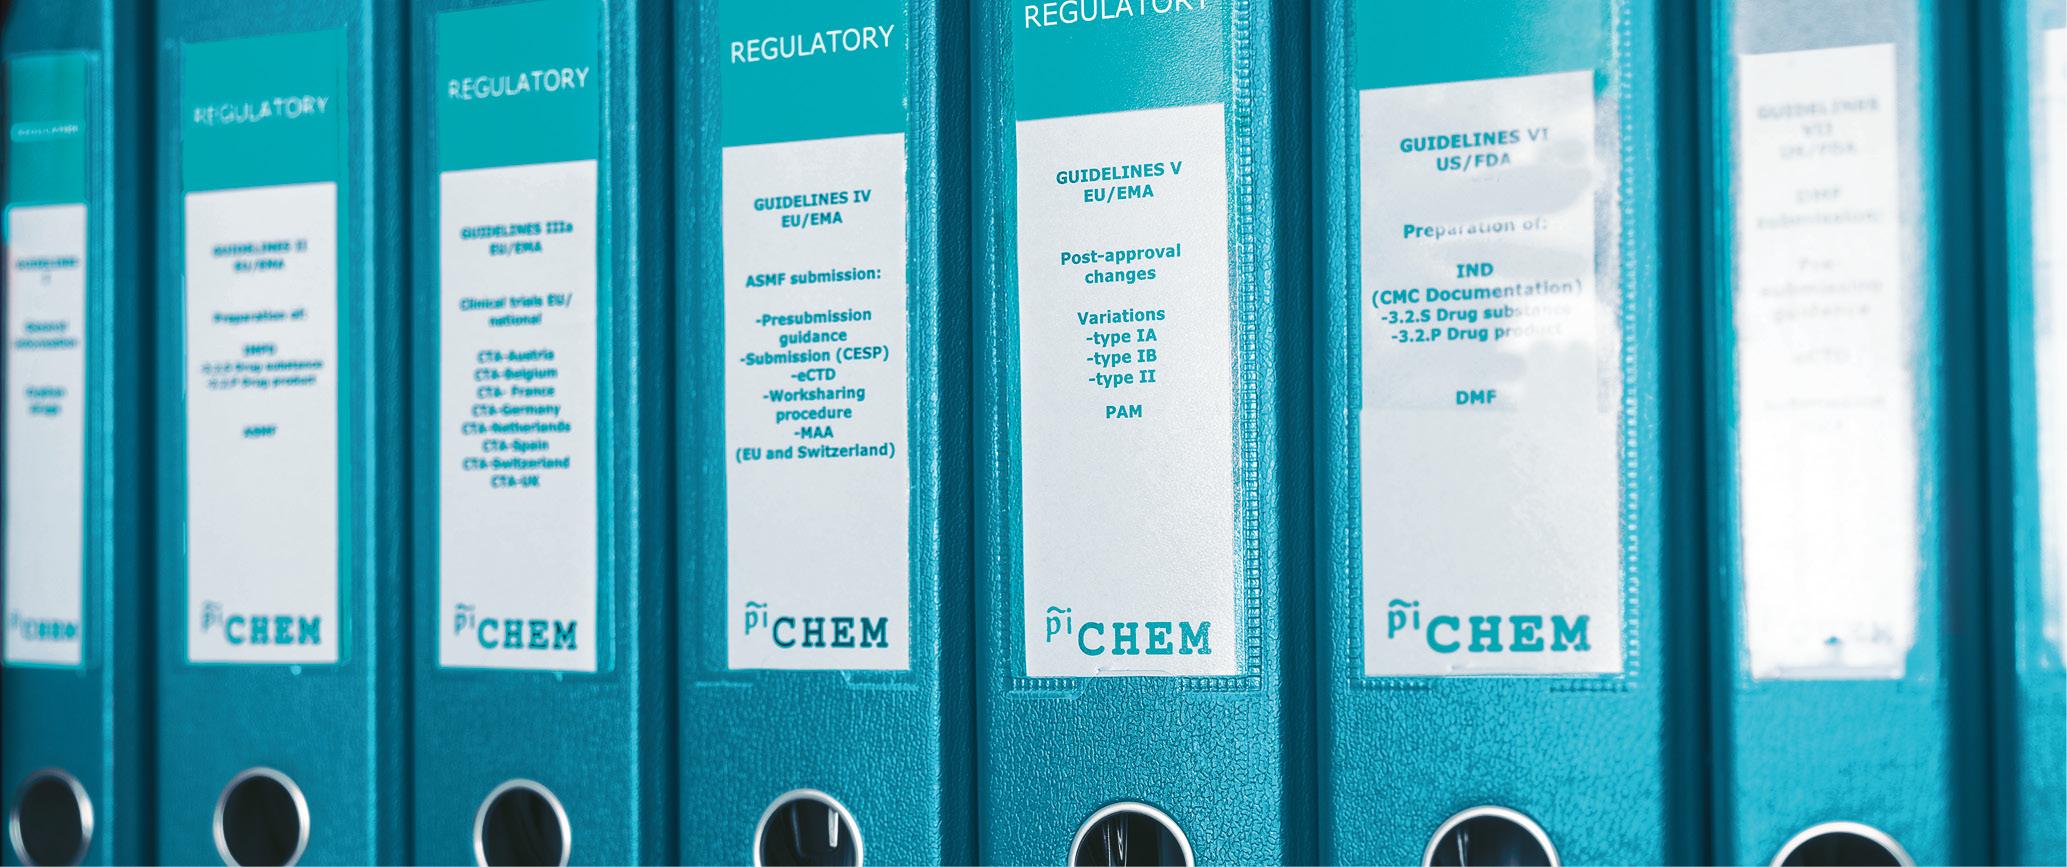 slider_services_regulatoryaffairs_ordner